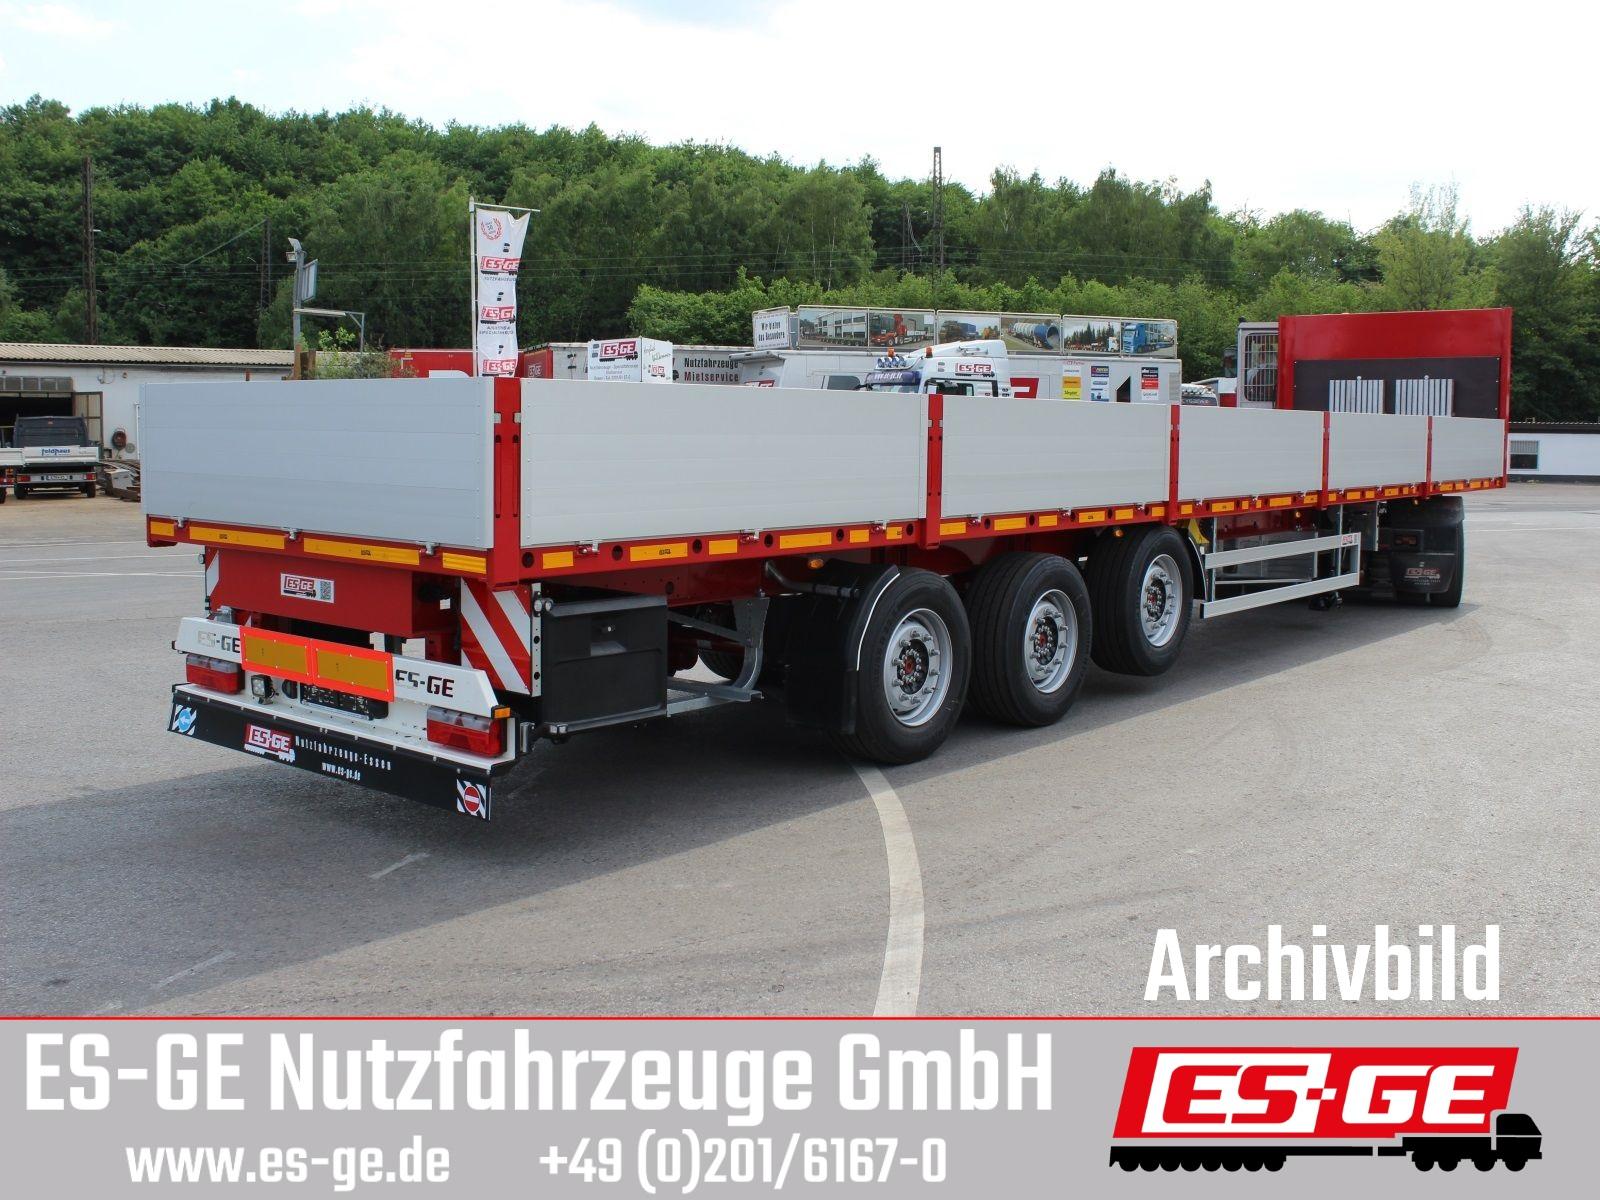 ES-GE ES-GE 3-Achs Sattelauflieger